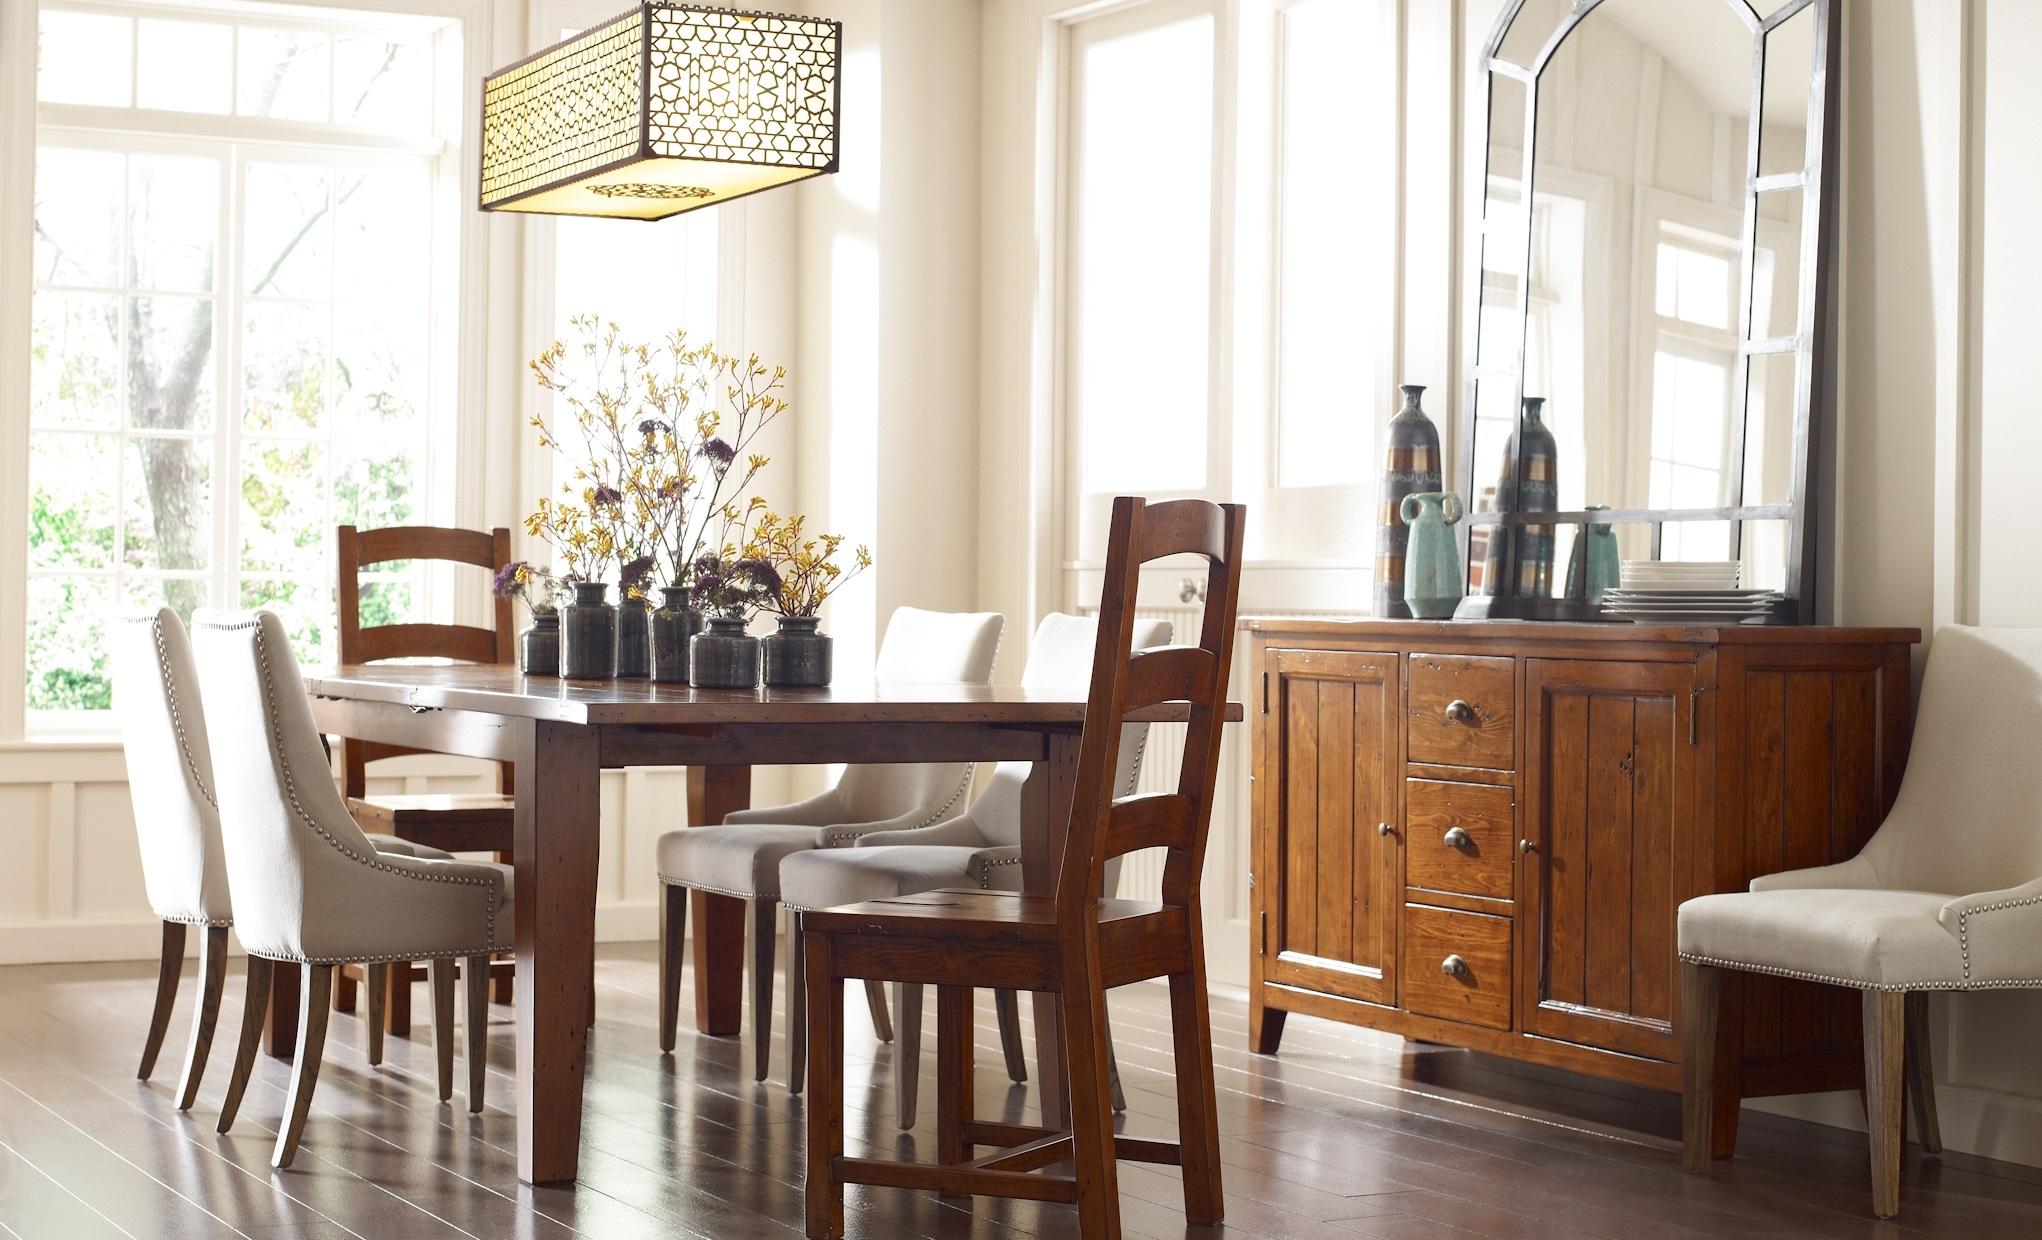 Coastal Beach Dining Room Design